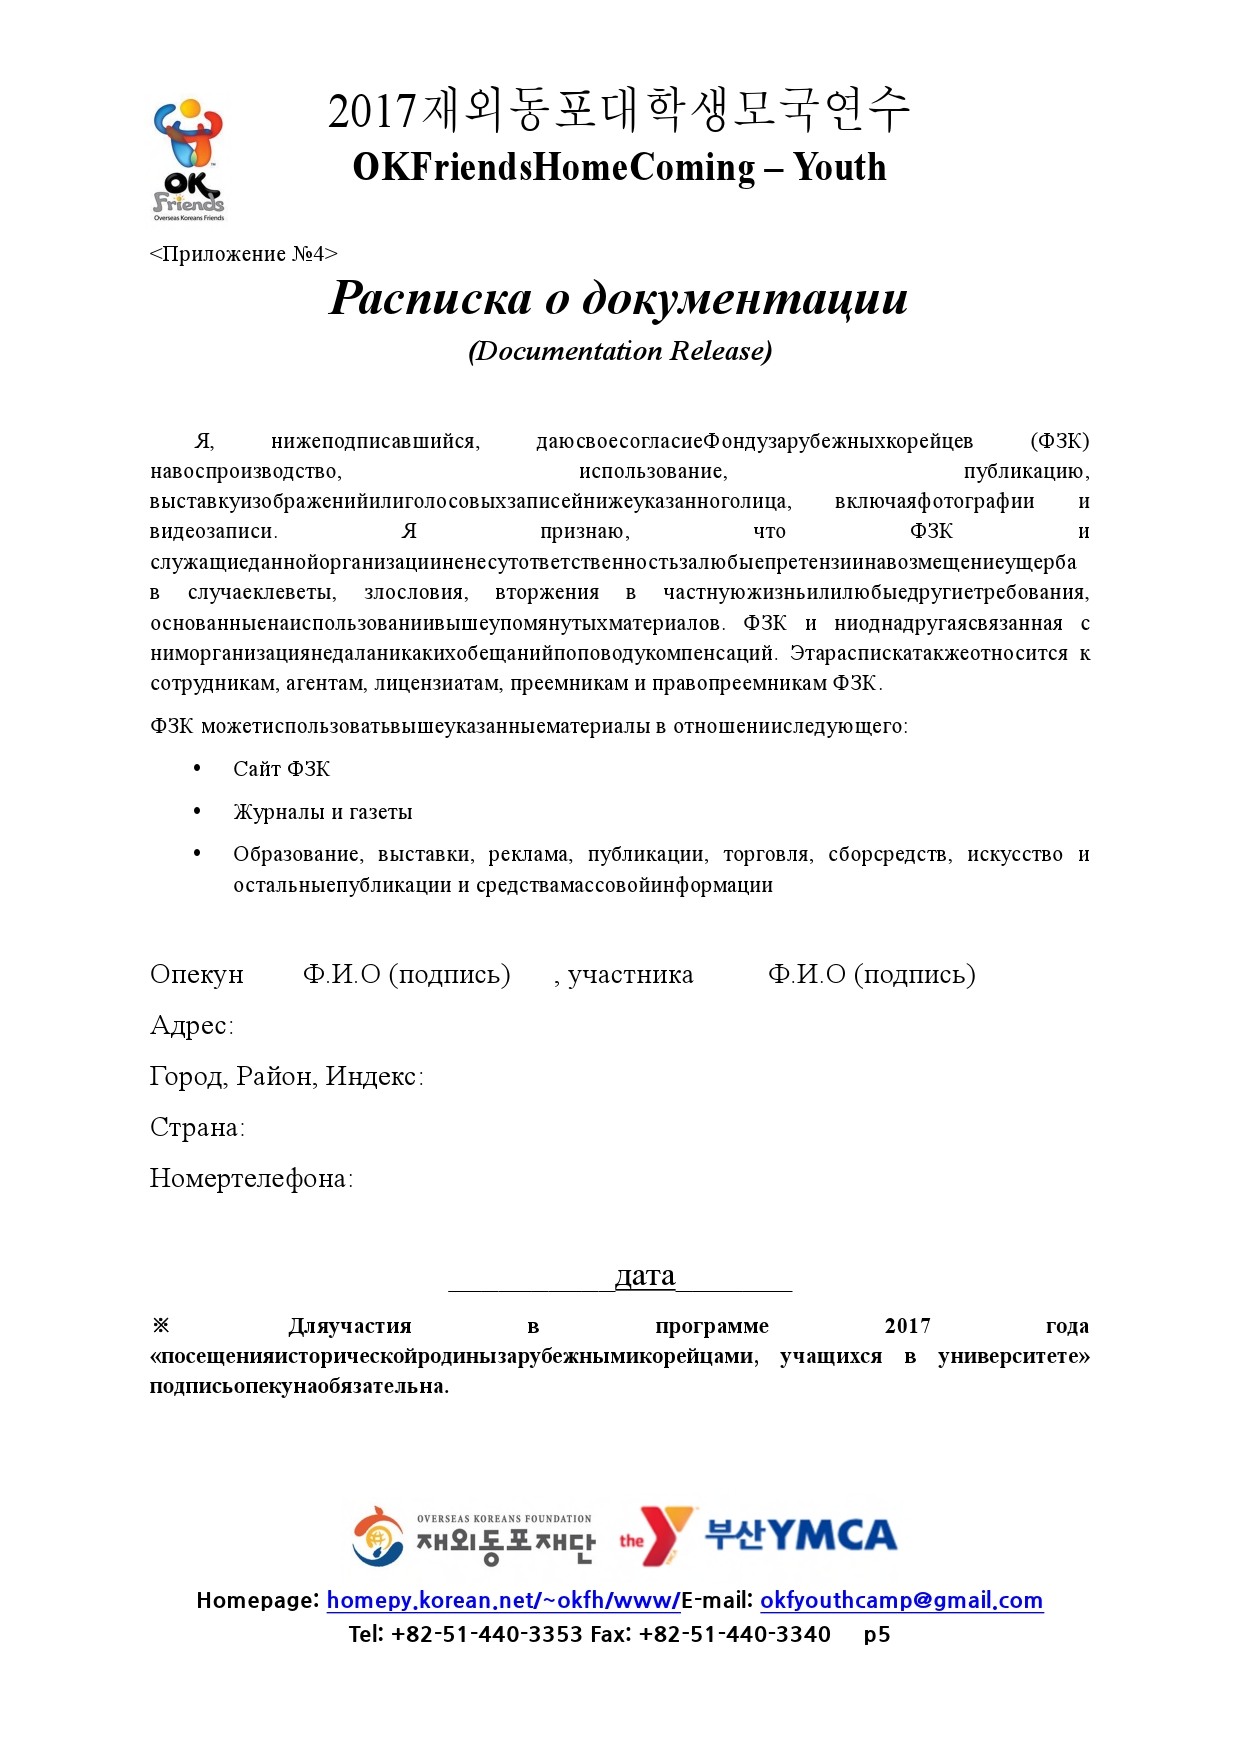 2017_OKF_YOUTH_INFO_1_RUS_1-5.jpg